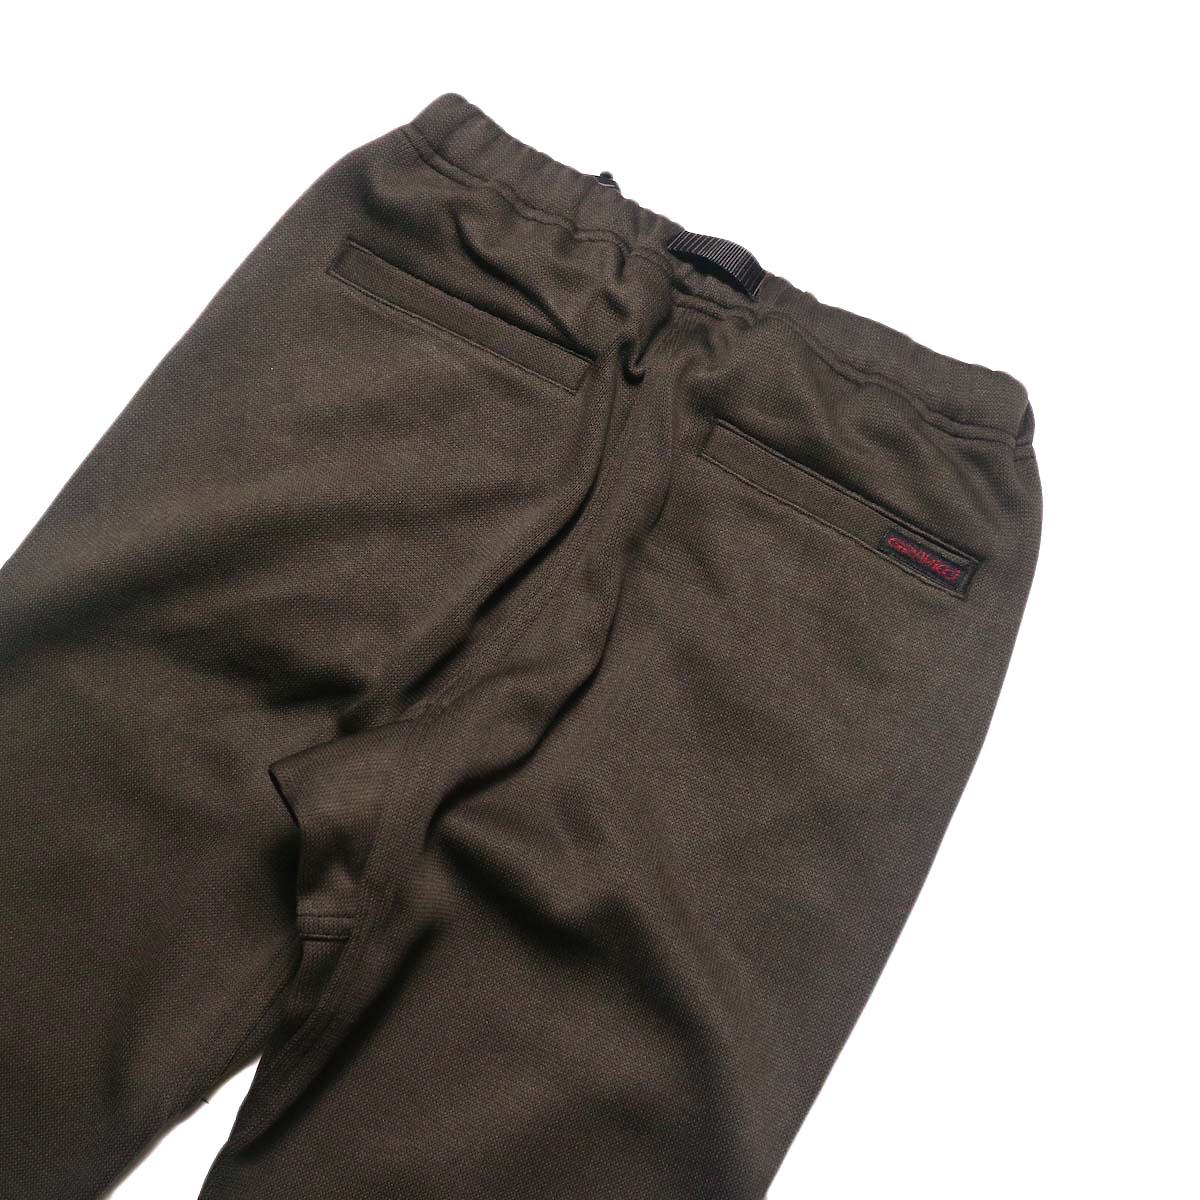 GRAMICCI / BONDING KNIT FLEECE NN-PANTS JUST CUT (Dark Brown)ヒップポケット